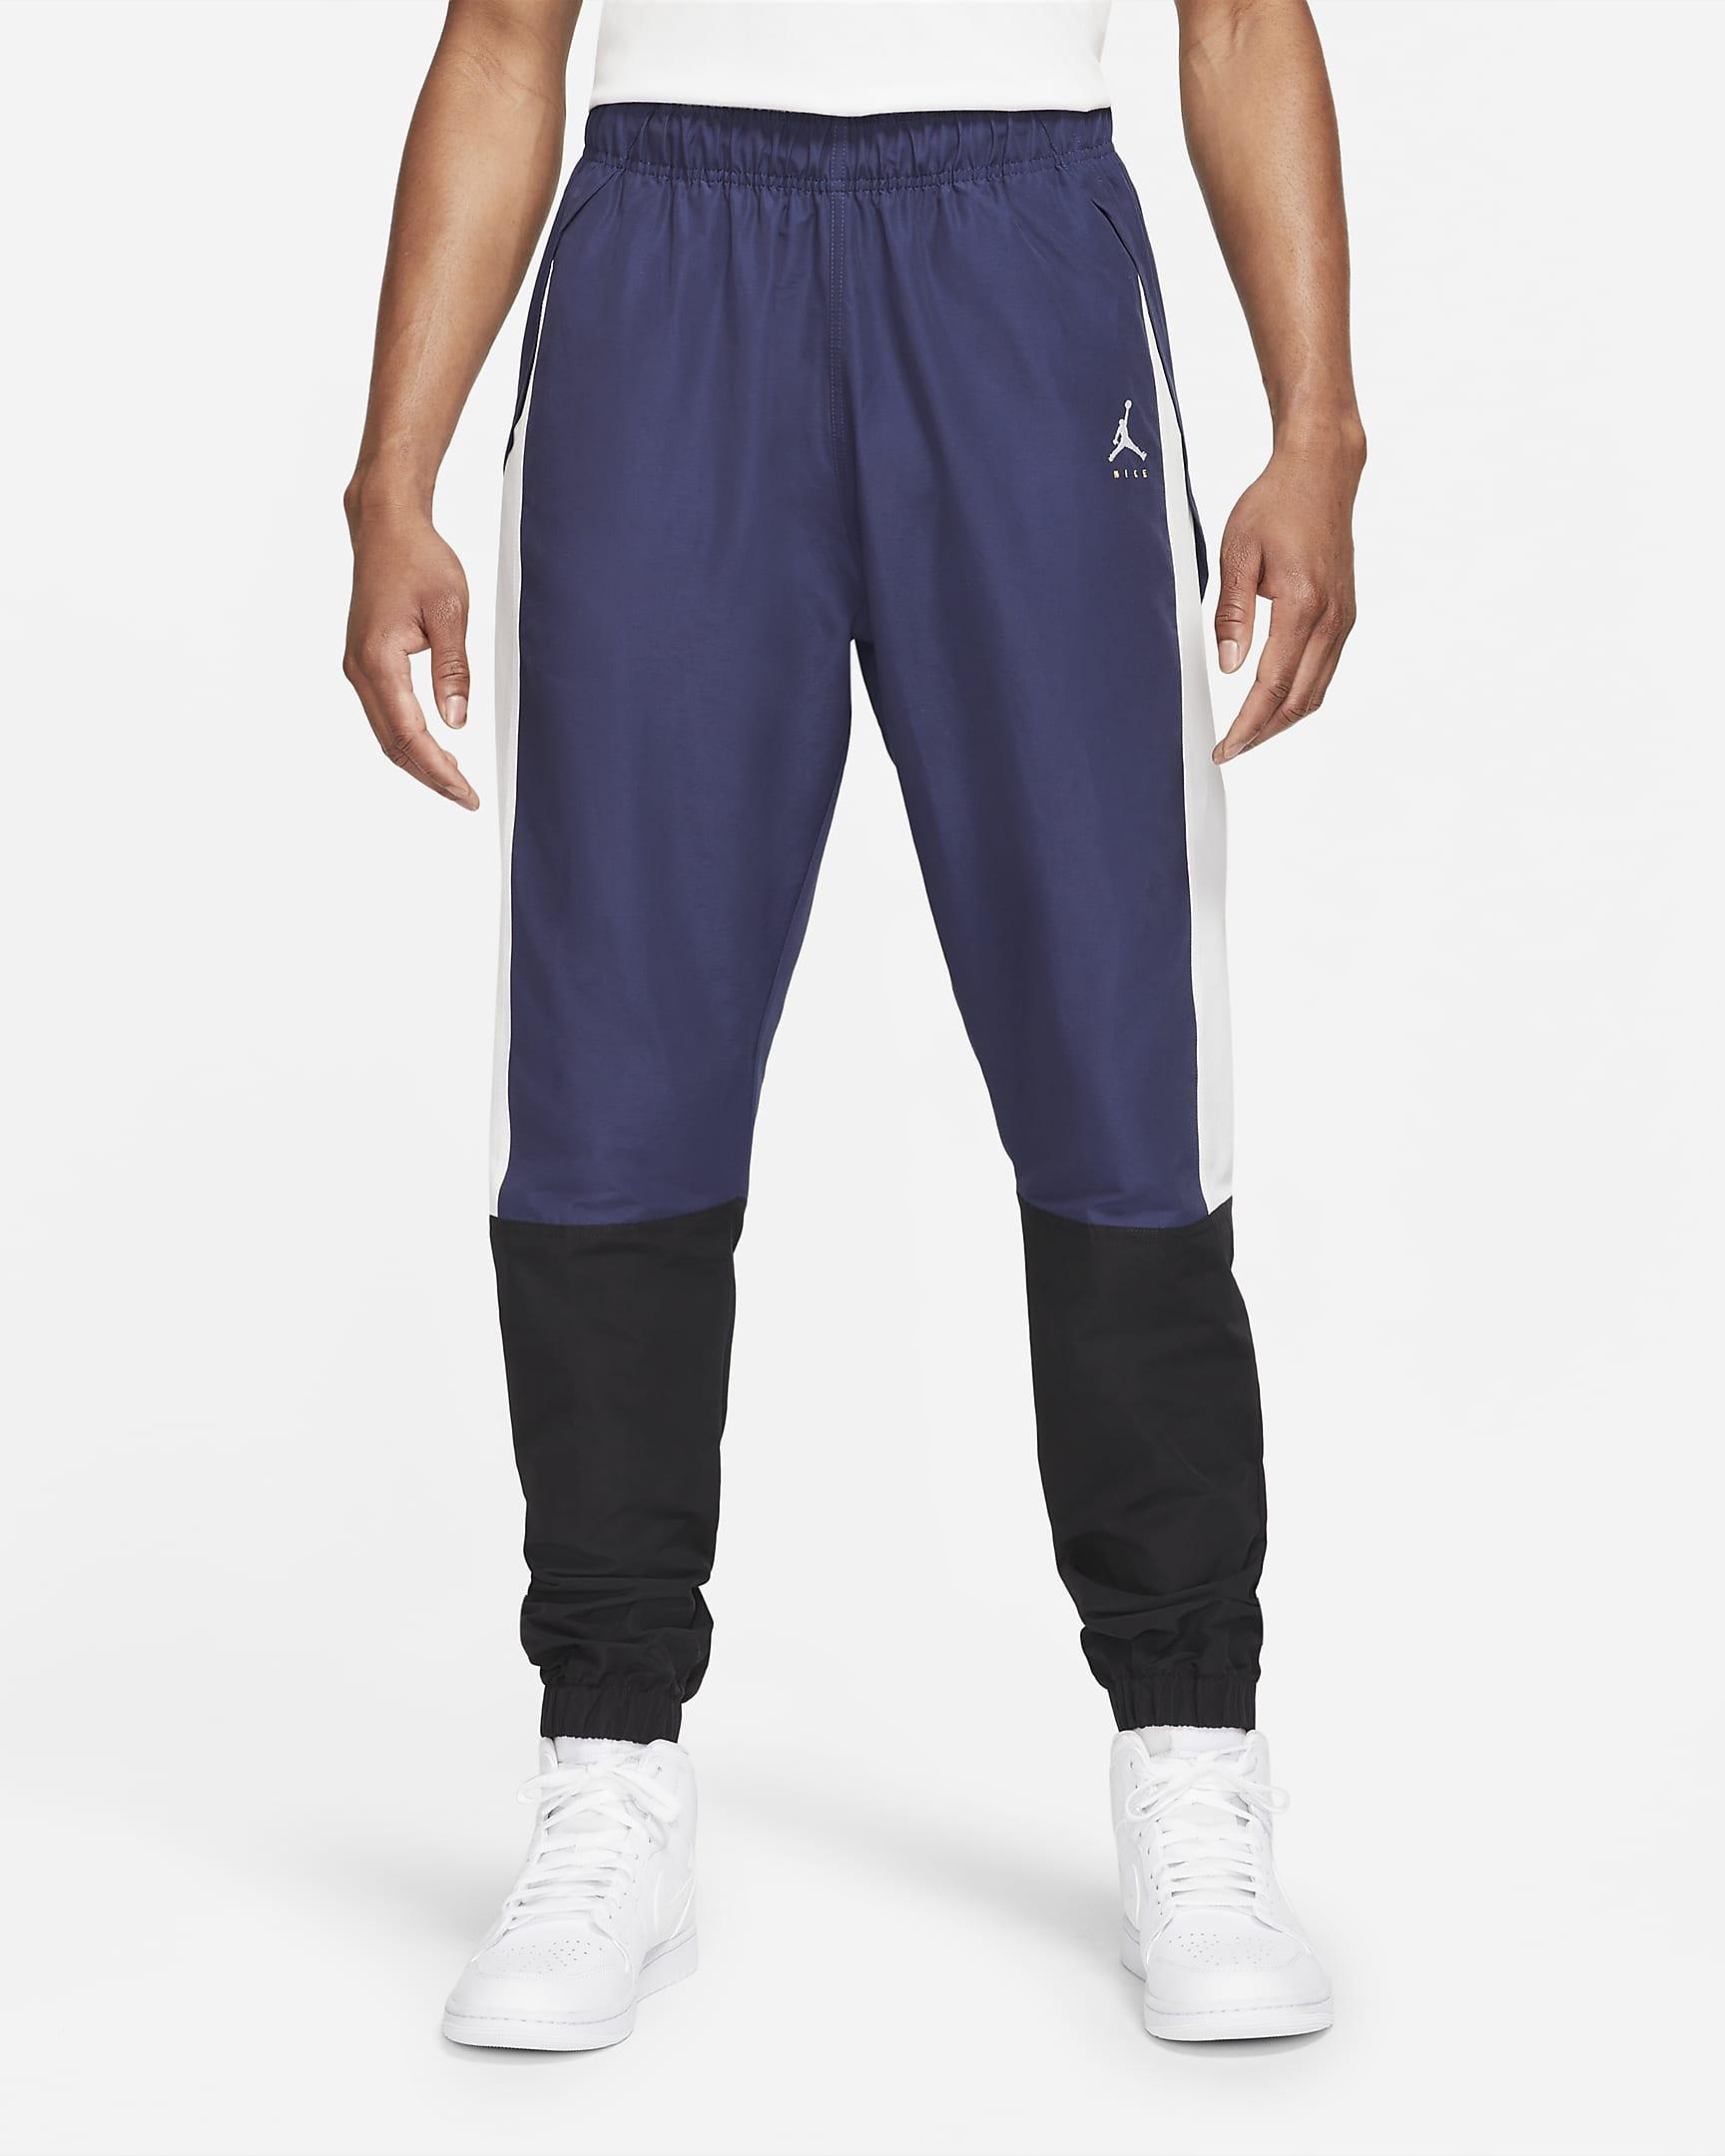 jordan-jumpman-mens-woven-pants-4BkNRR.png